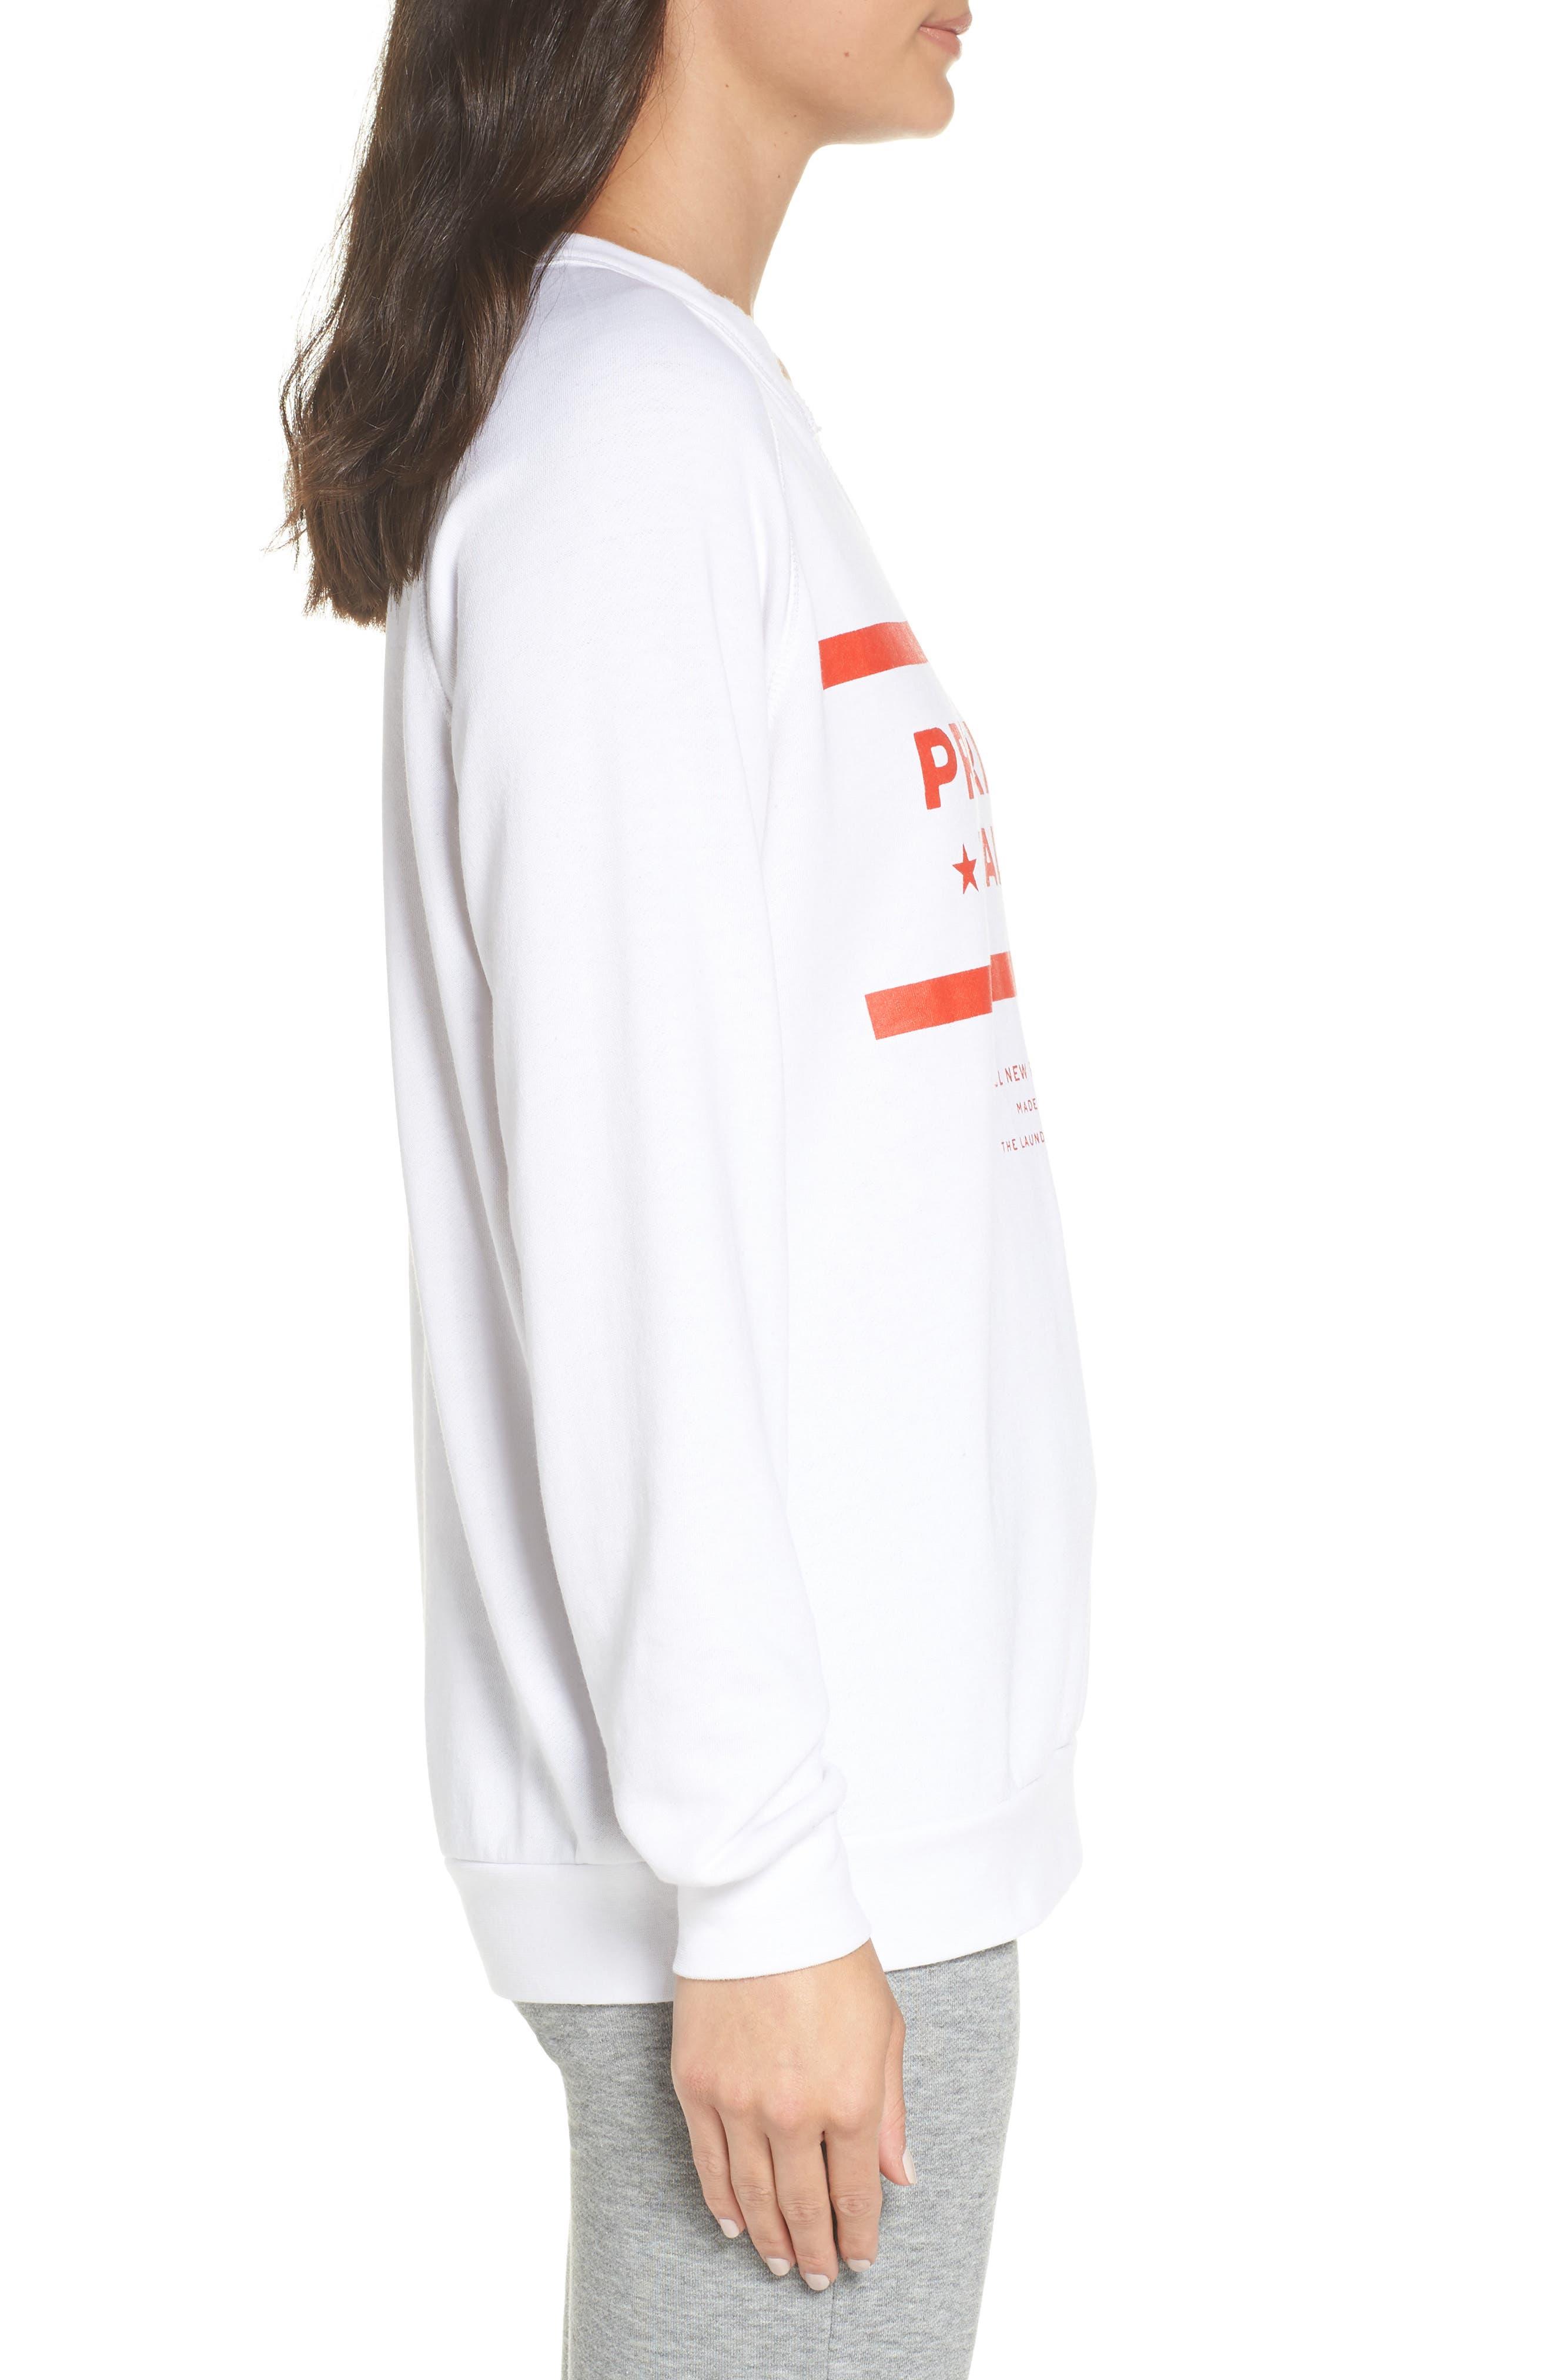 Priority Female Sweatshirt,                             Alternate thumbnail 3, color,                             100